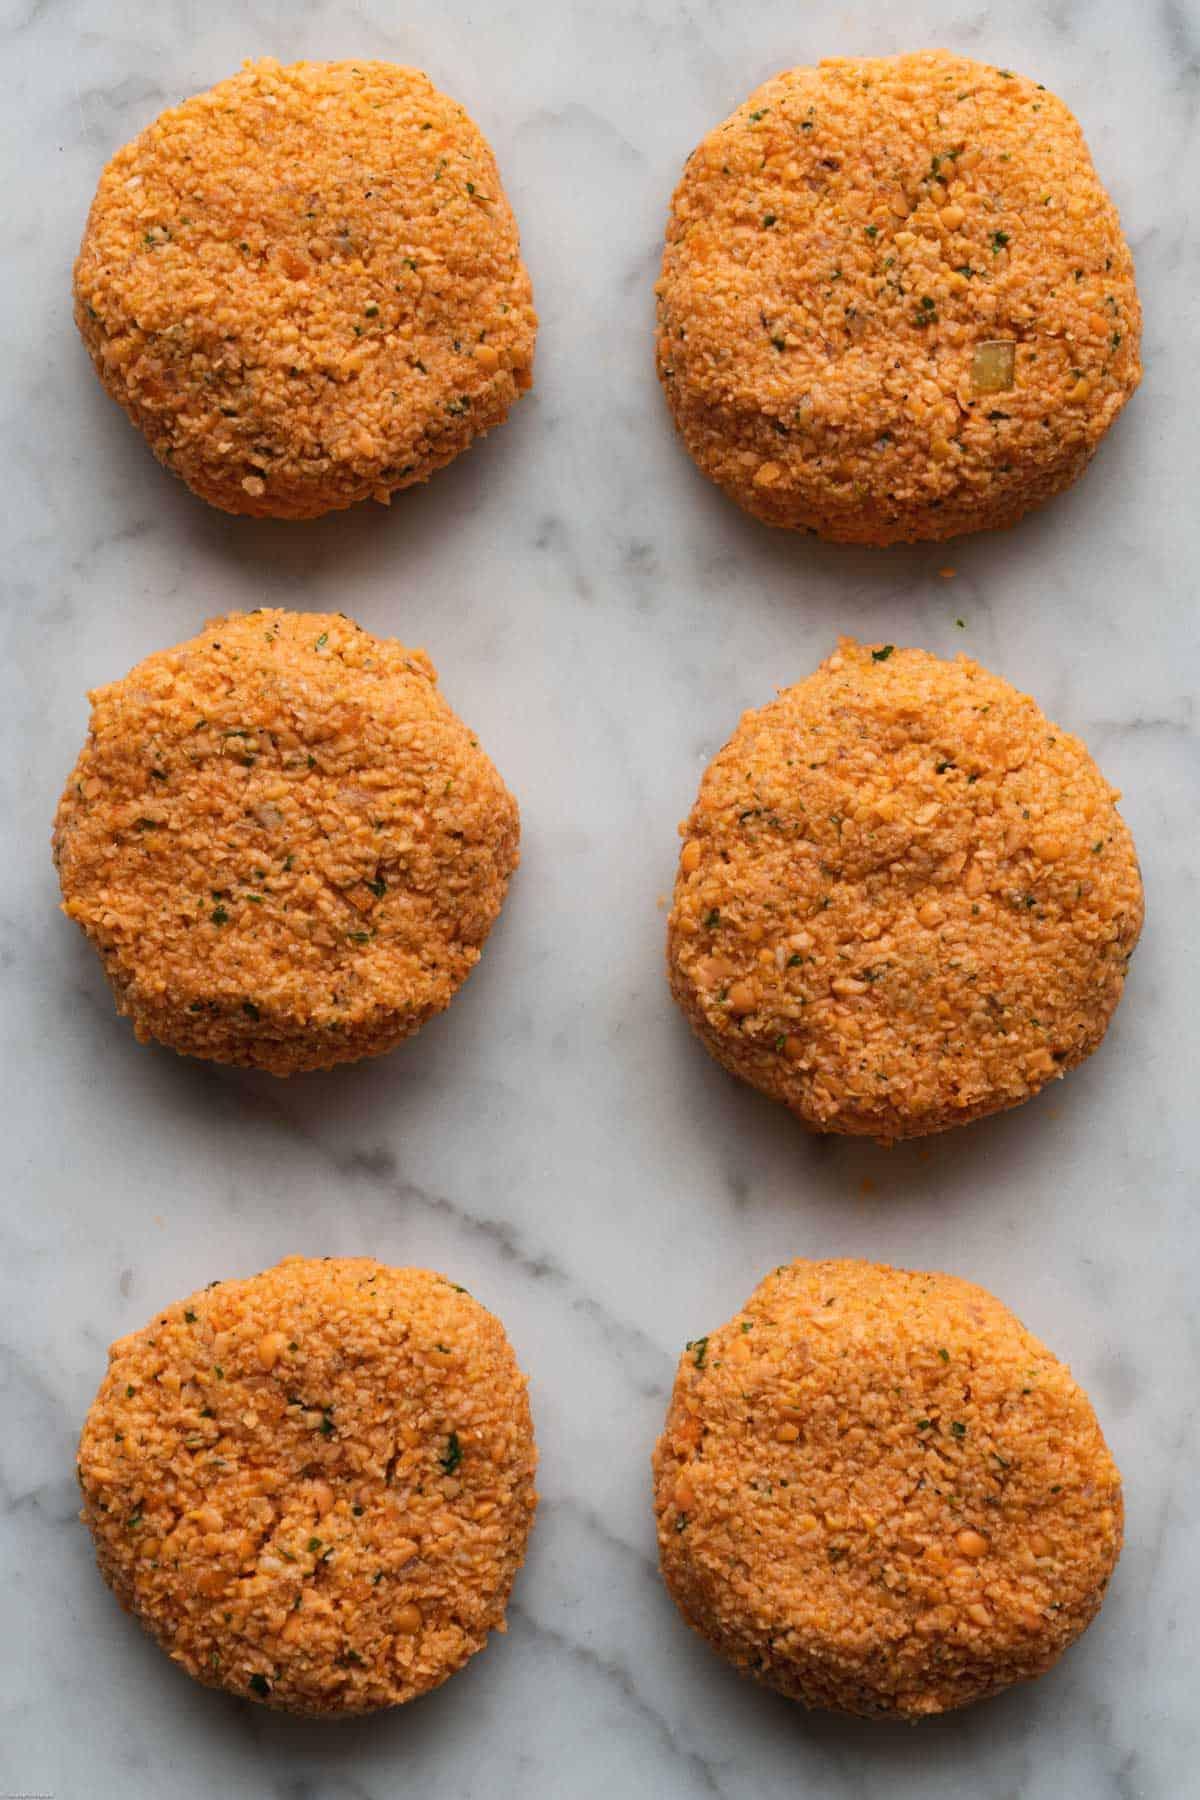 Six Easy 6-ingredient lentil patties ready to bake.